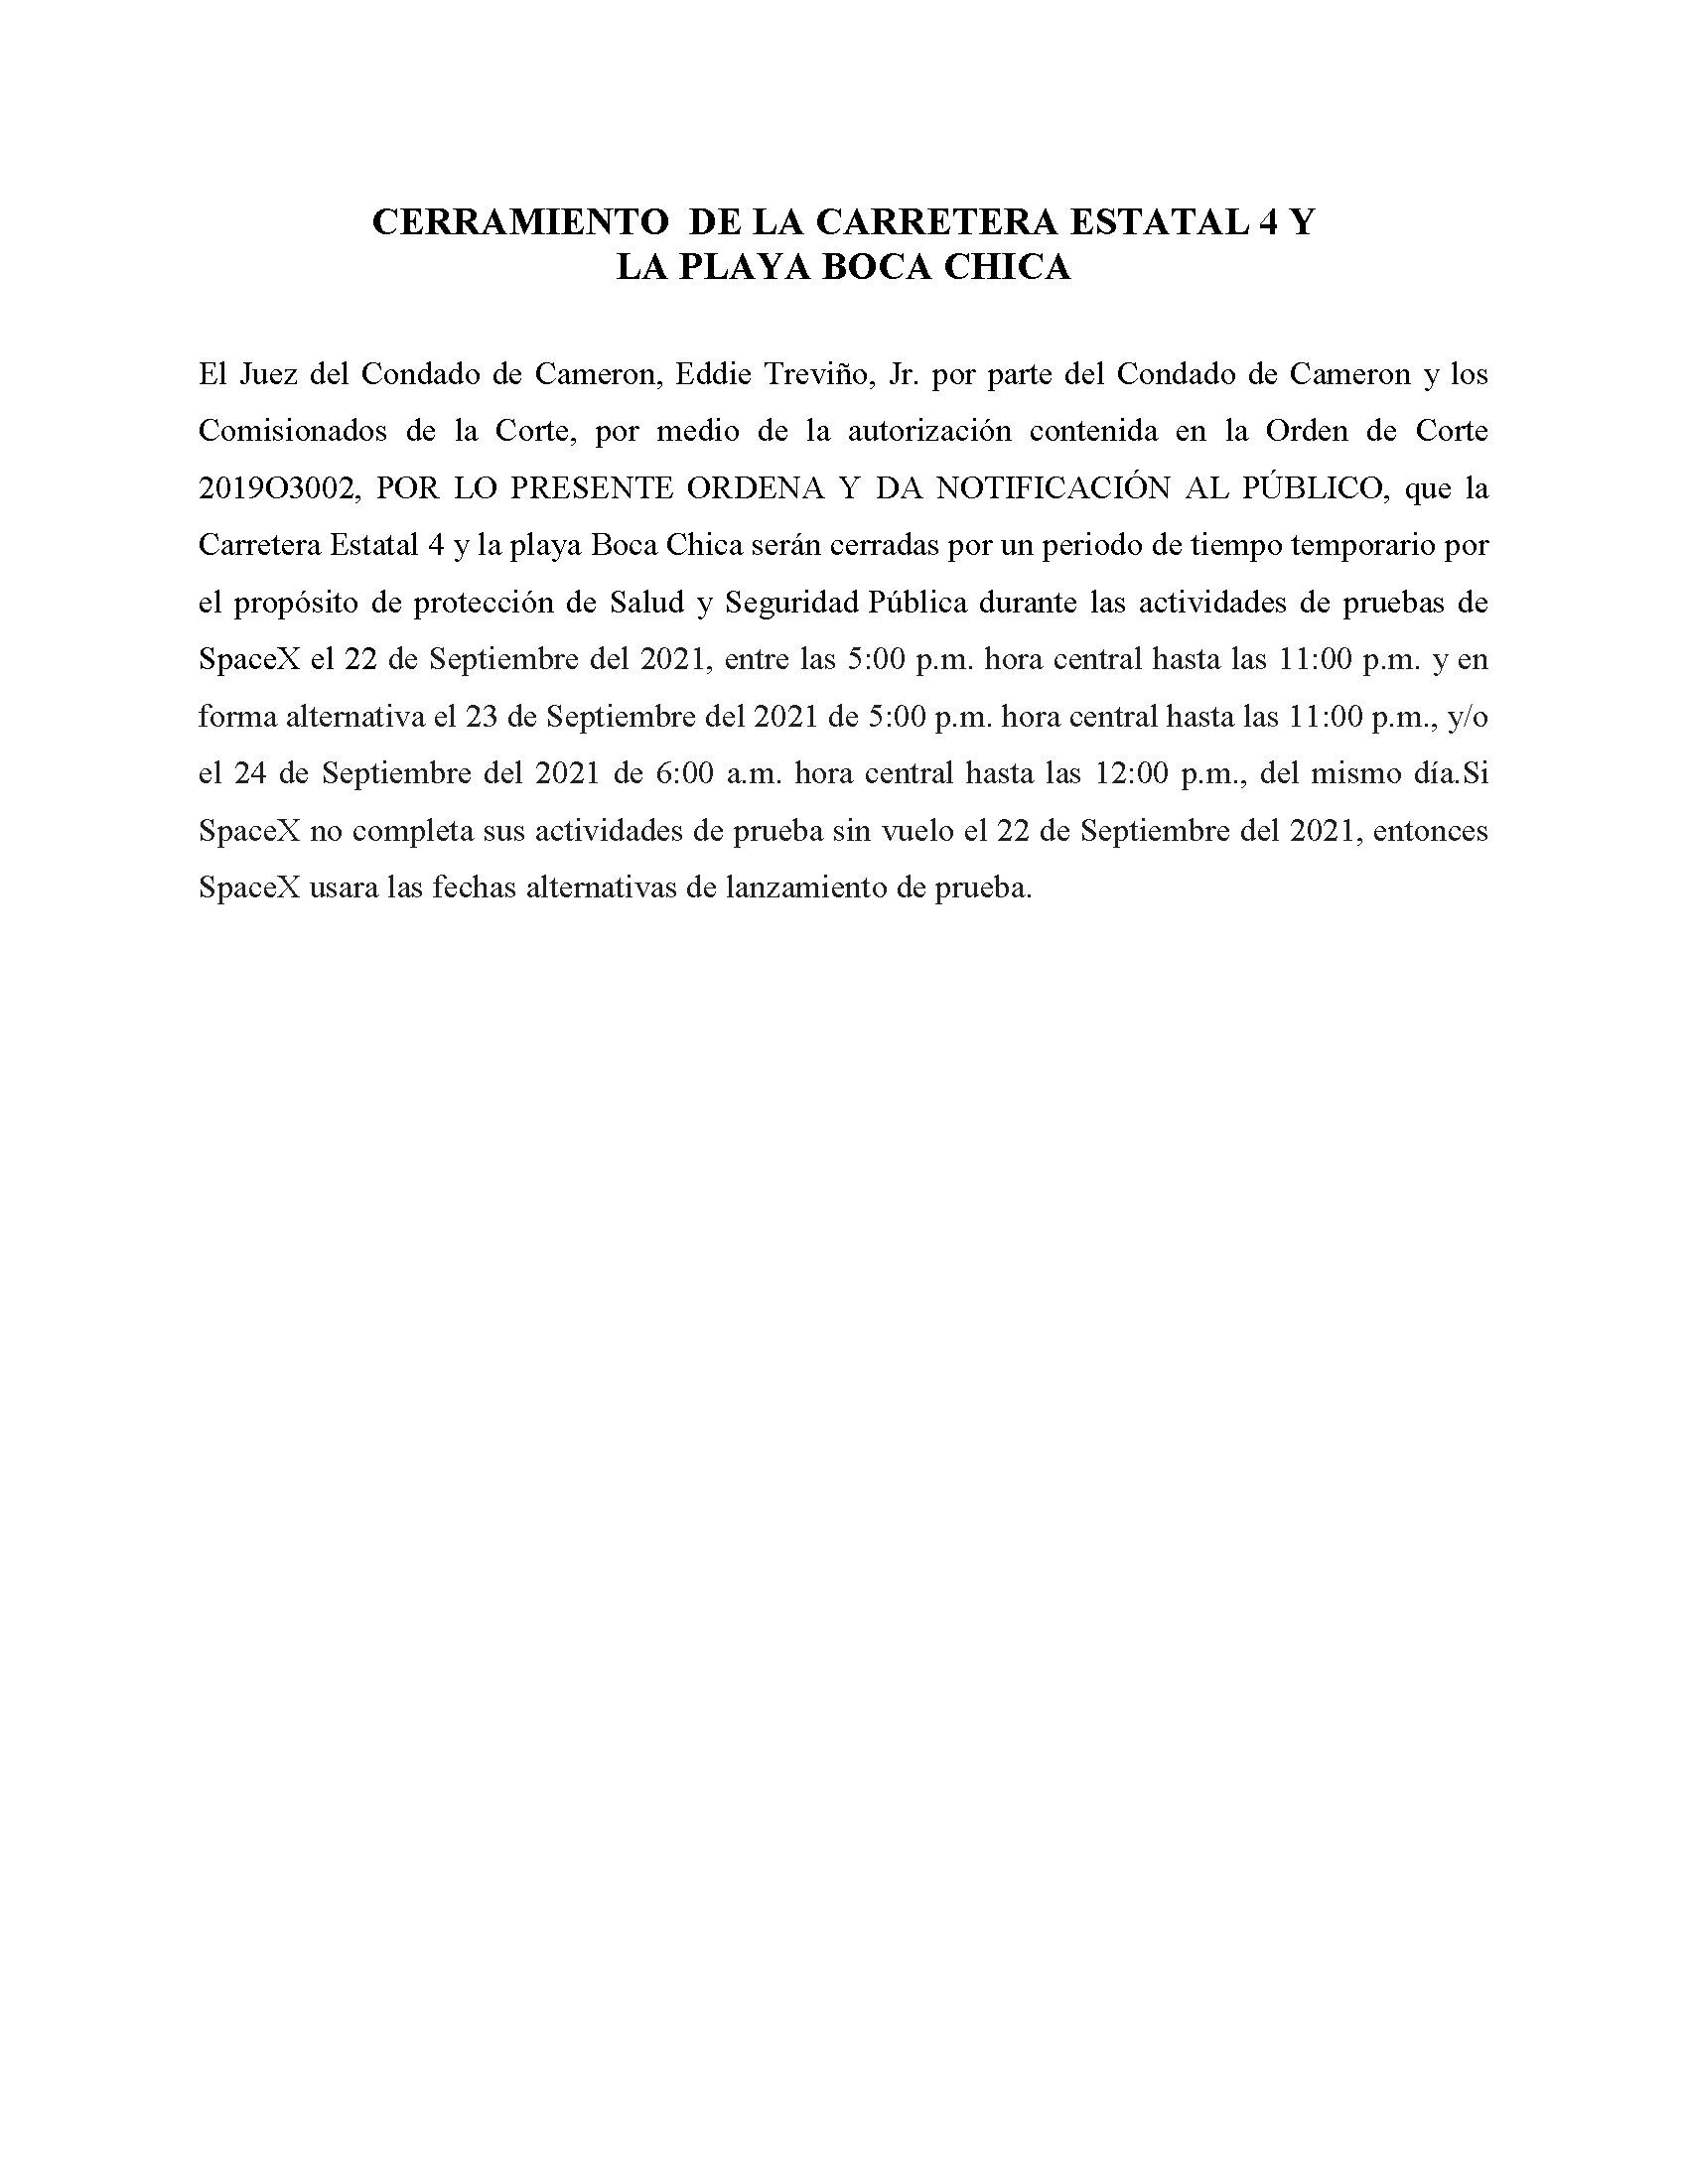 ORDER.CLOSURE OF HIGHWAY 4 Y LA PLAYA BOCA CHICA.SPANISH.09.22.2021